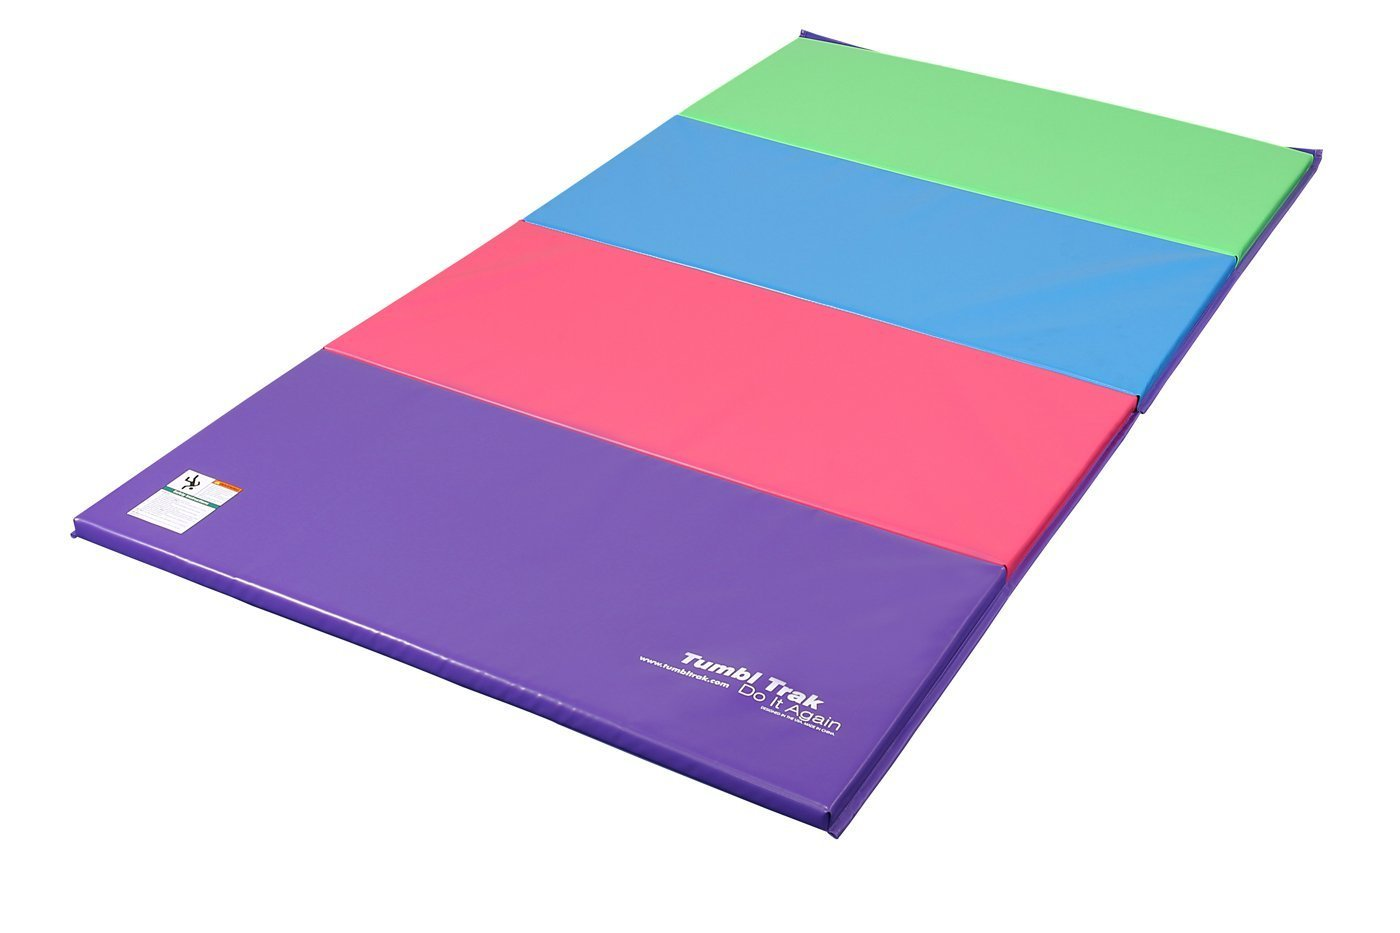 Buy Tumbl Trak Folding Gymnastics Mat 4ft X 8ft Online At